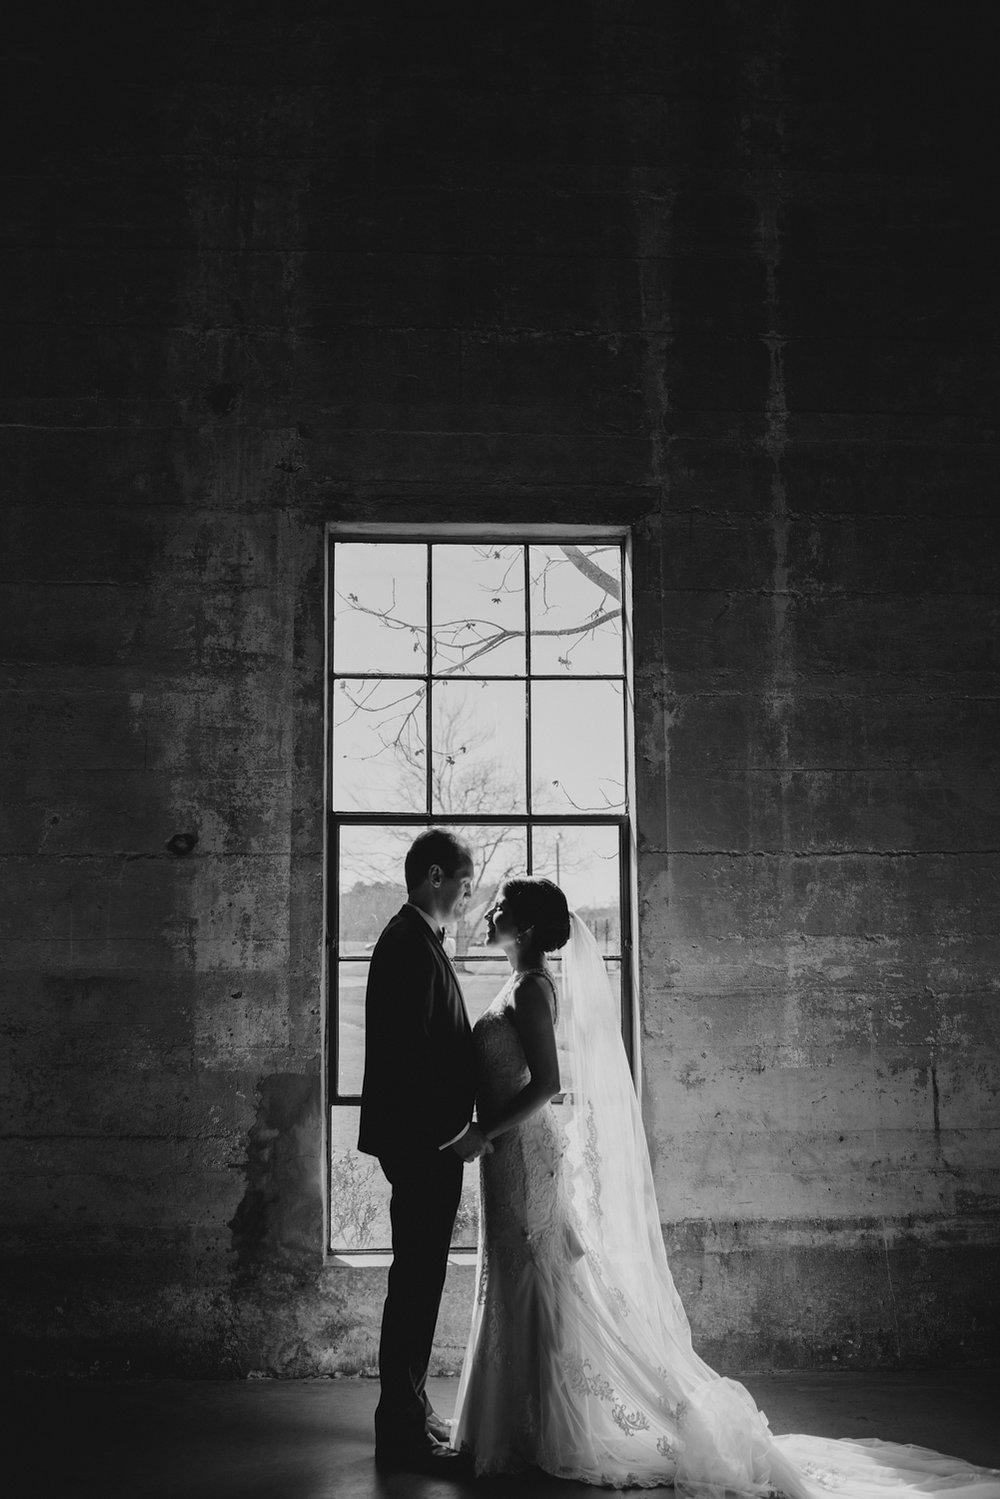 casperwedding-texasweddings-houstonweddings-oldedobbestation-montgomerytx-montgomeryweddings-bride-groom-bridalparty-weddingdress-64.jpg